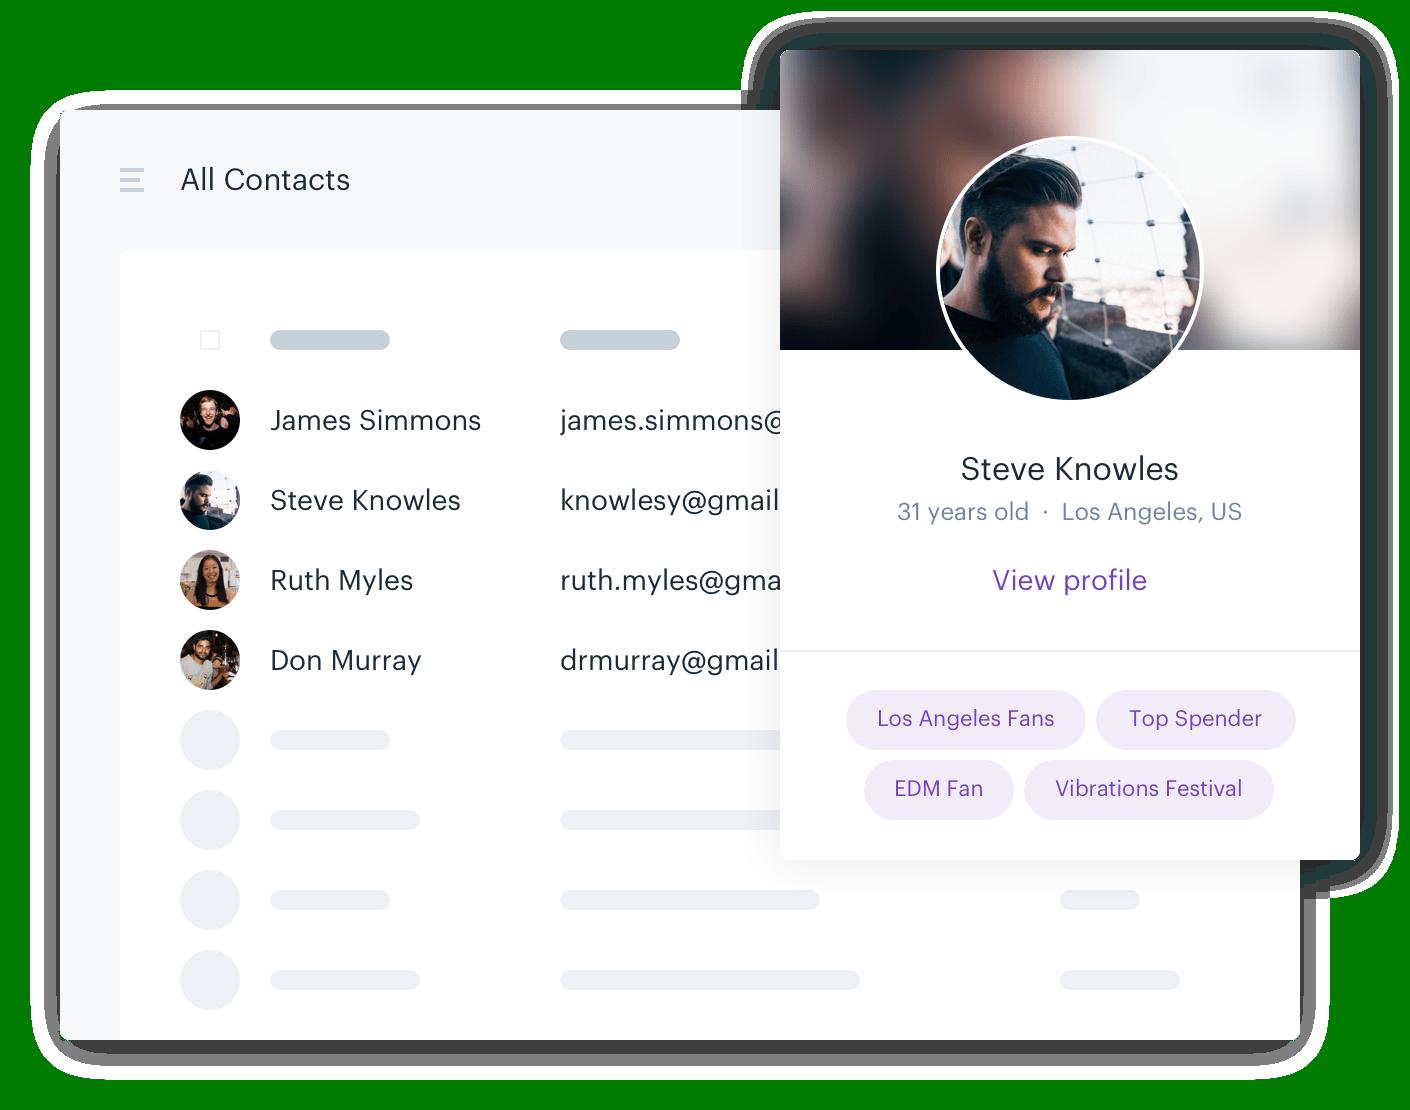 Customer profiles on the Audience Republic platform